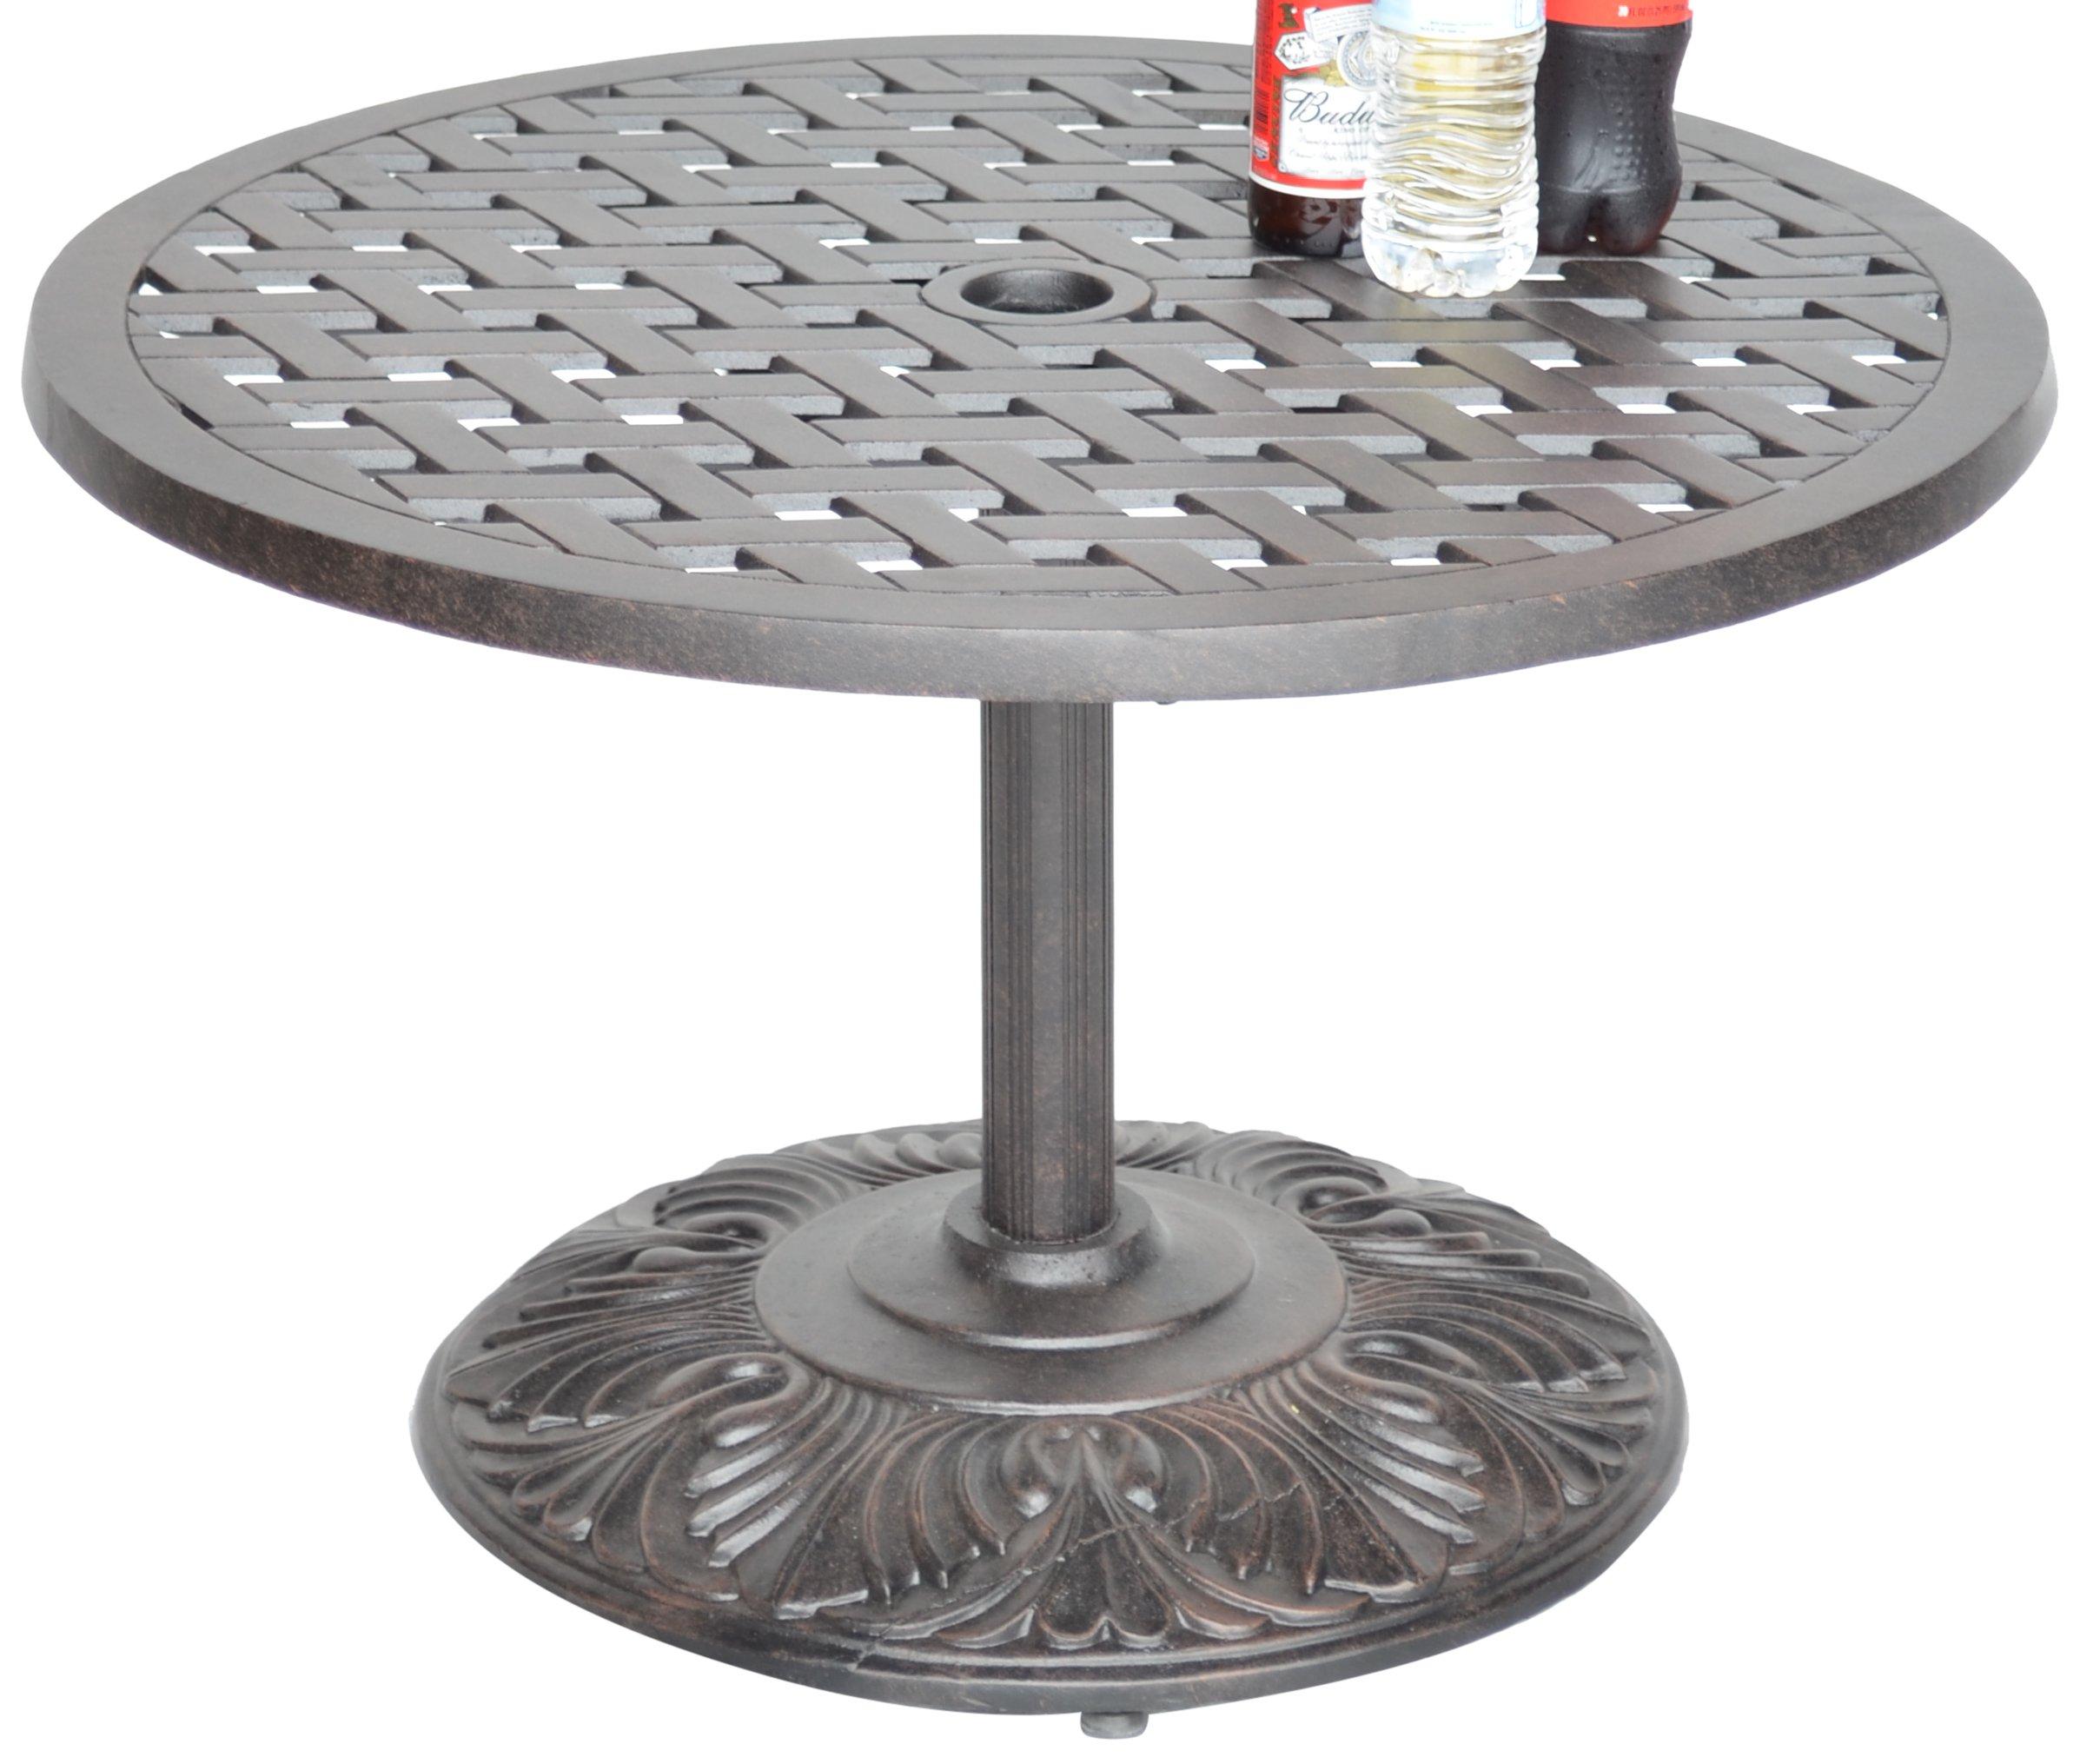 K&B PATIO LD1031PE-30 Nassaupedestal Coffee Table, 30'', Antique Bronze